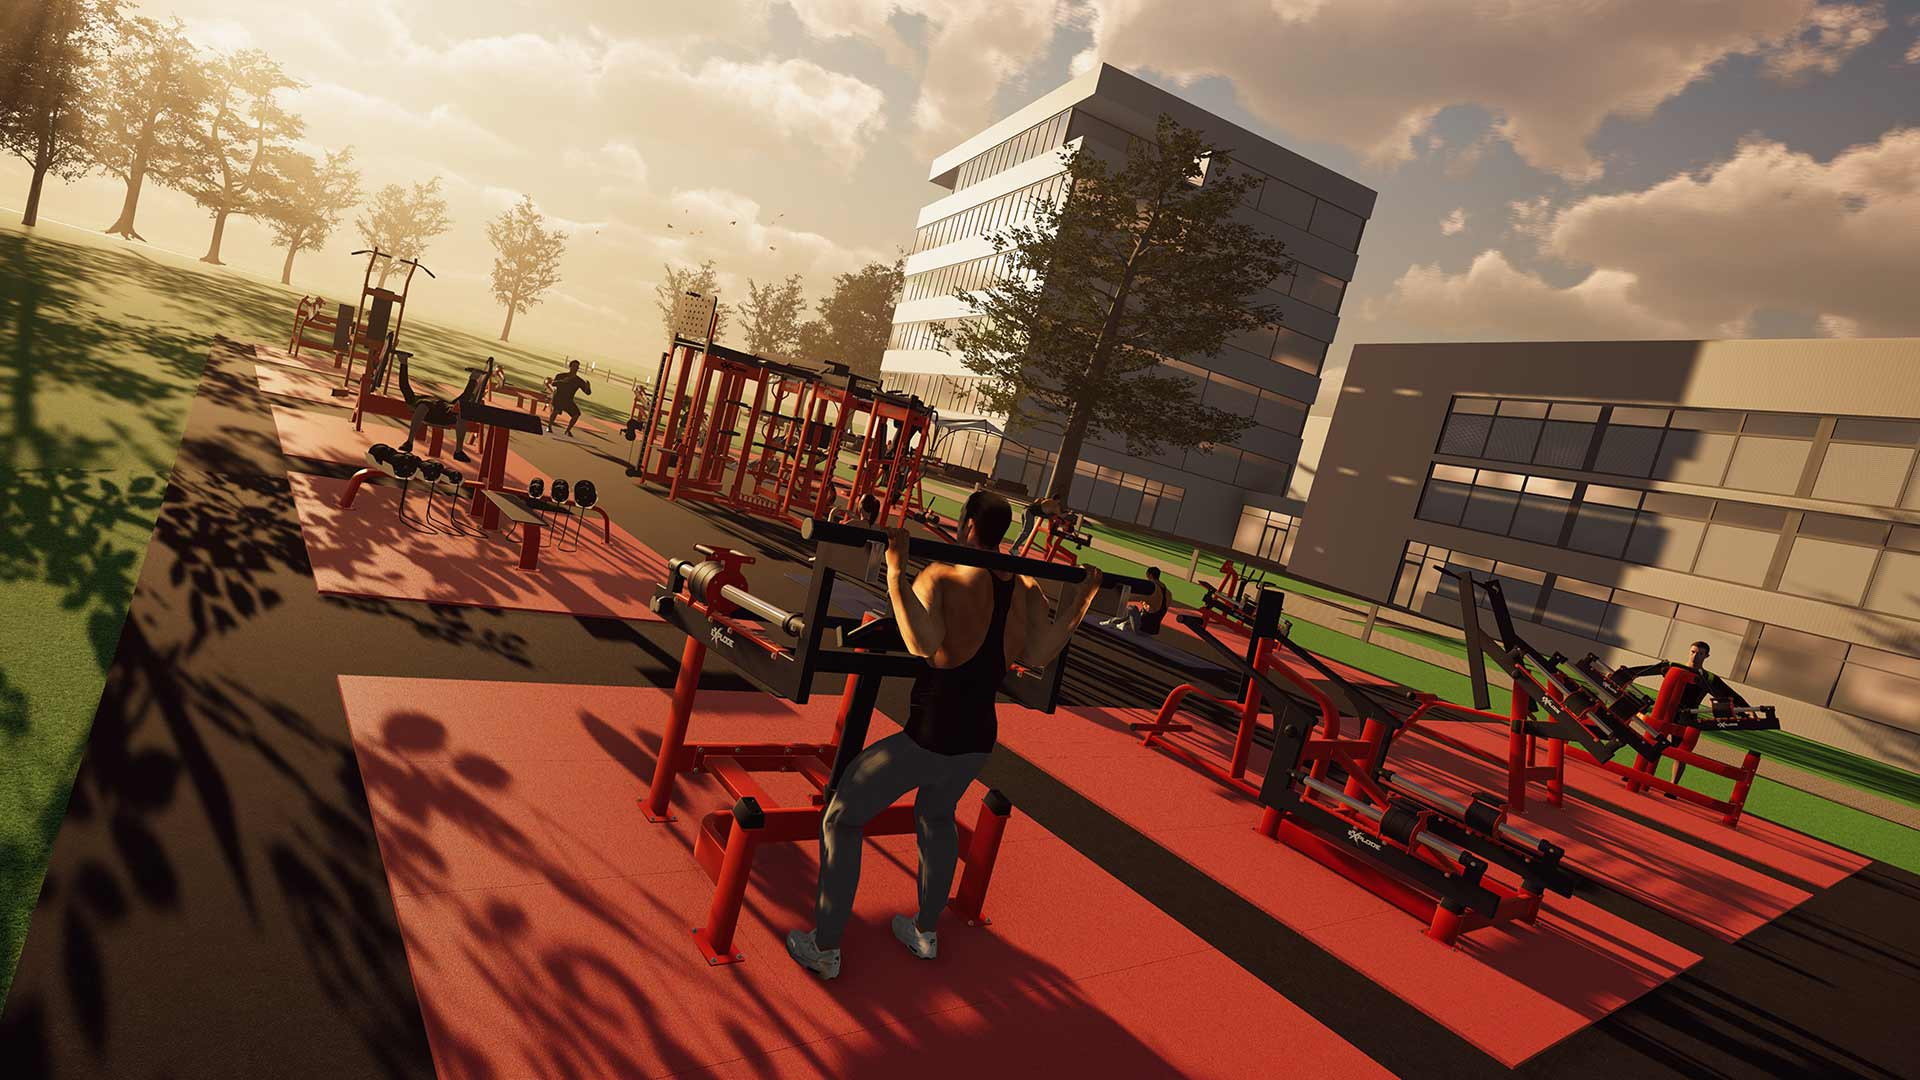 limbitech-outdoor-gym-illustration-01